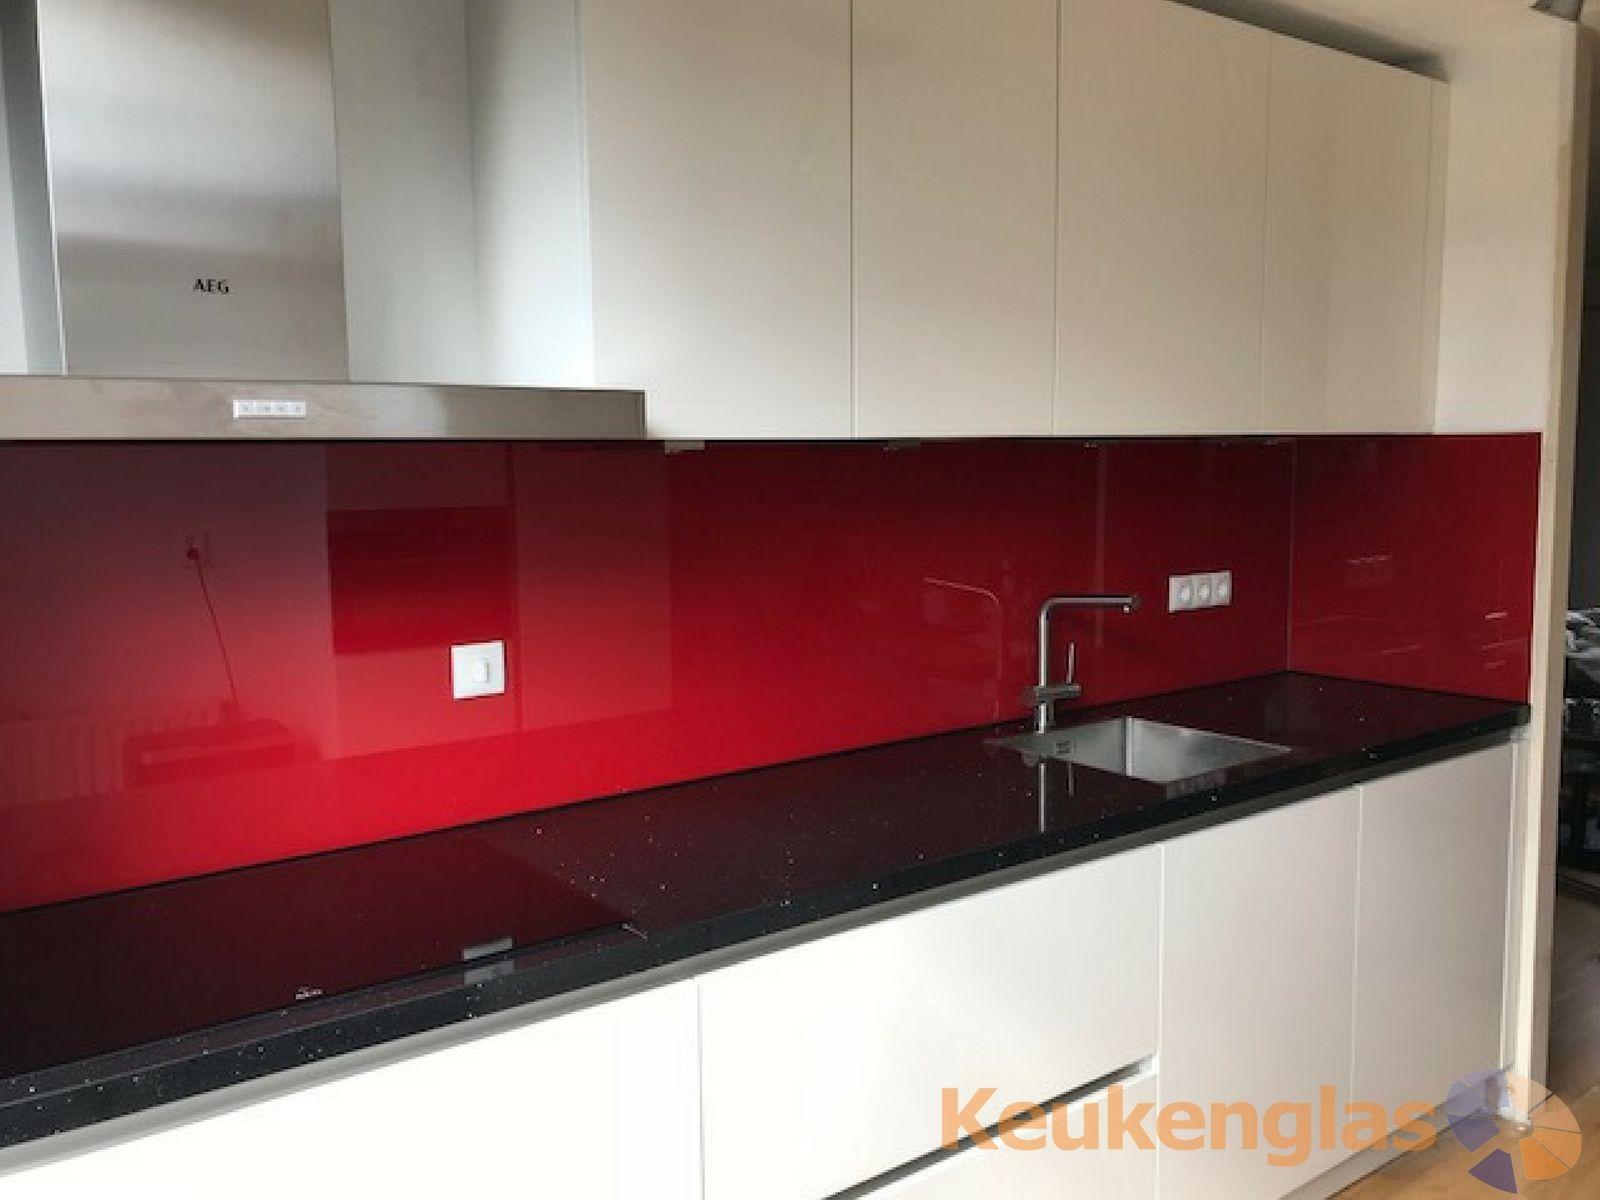 Achterwand Keuken Ideas : Glazen achterwand van keukenglas in de kleur rood #keukenglas